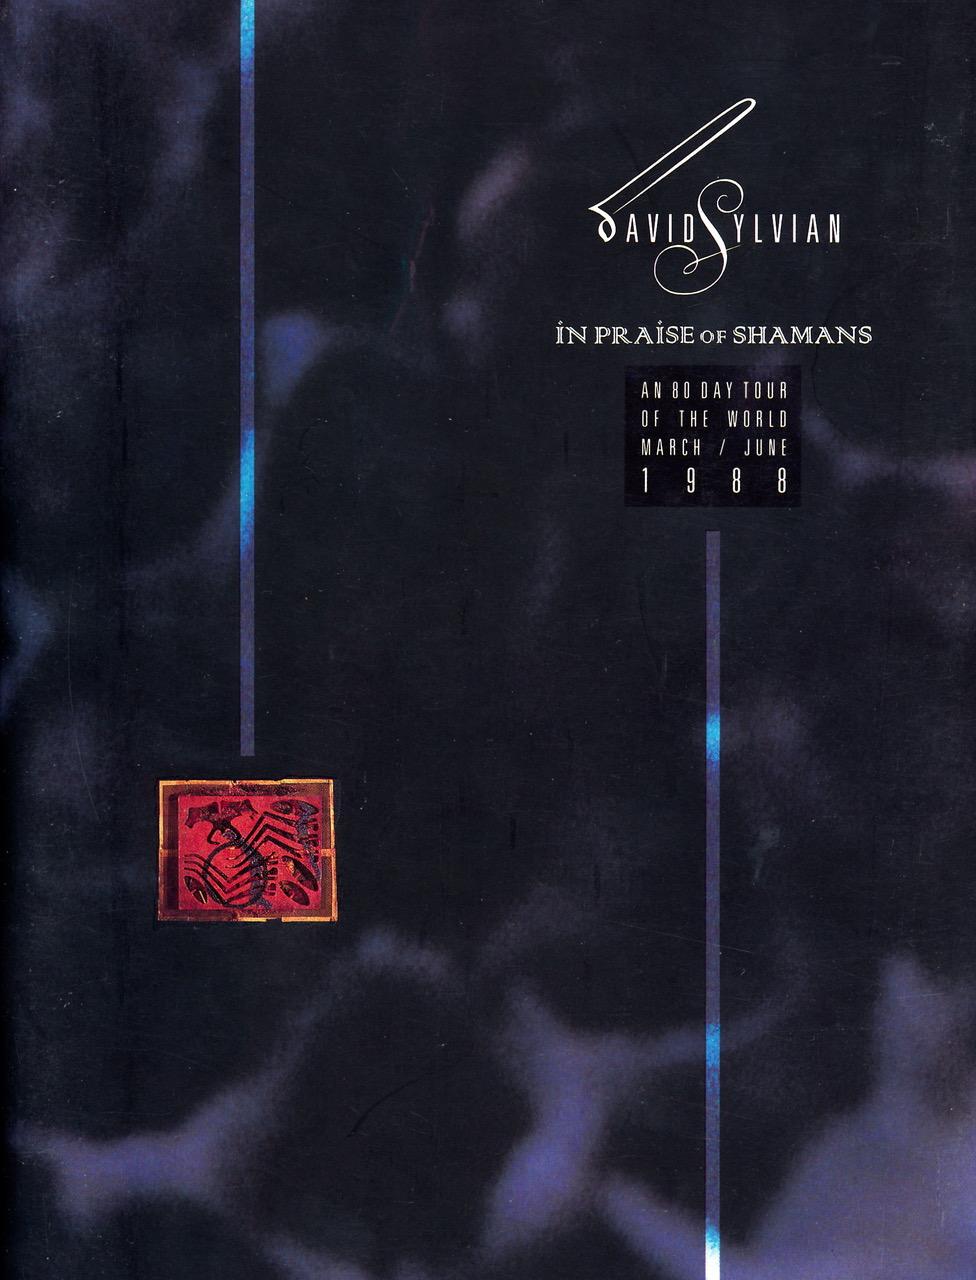 David Sylvian Programme